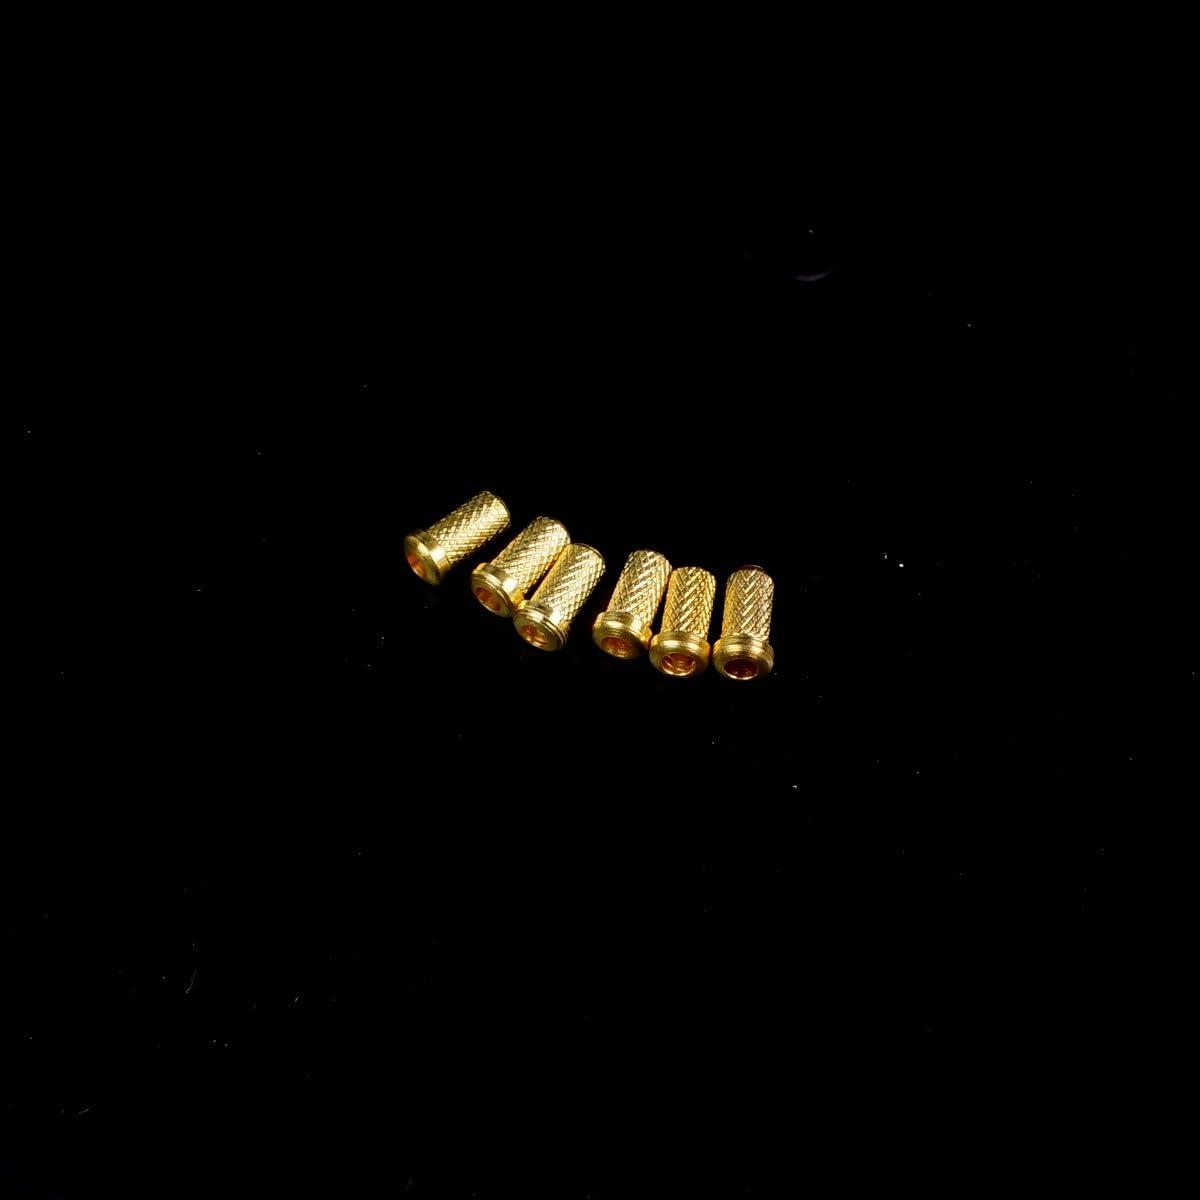 GOLD TOP MOUNT LOADING STRING-THRU BODY 4MM MINI GUITAR FERRULES SET OF 6